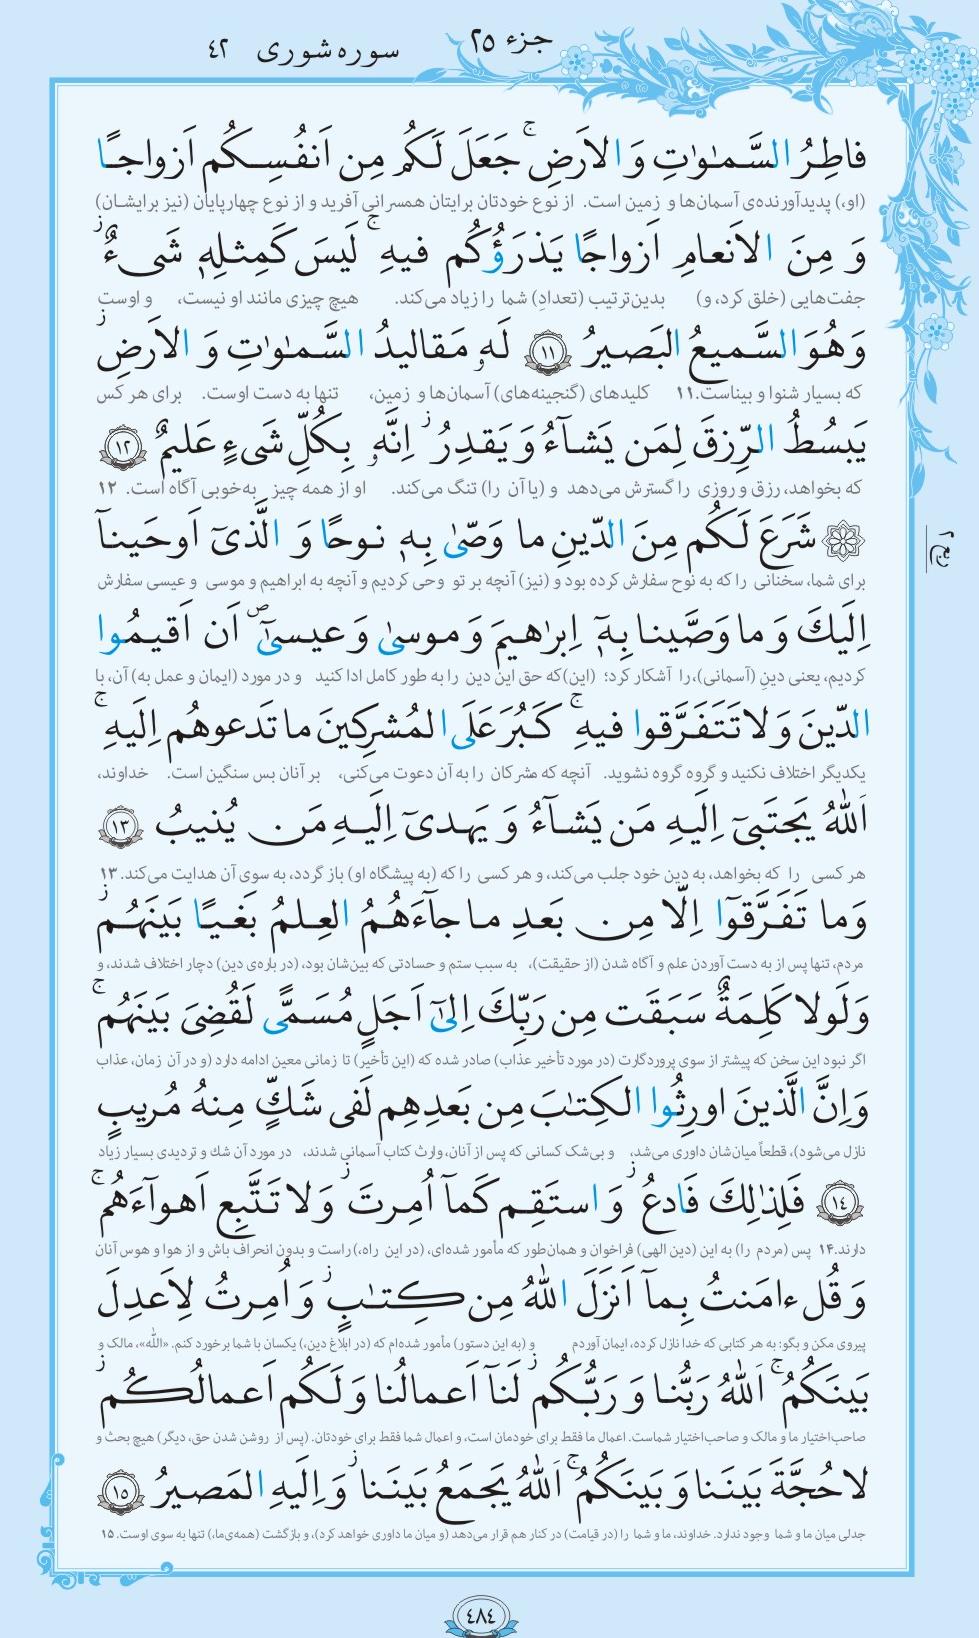 13990625000850 Test NewPhotoFree - ترتیل صفحه ۴۸۴ قرآن کریم+فیلم و متن آیات